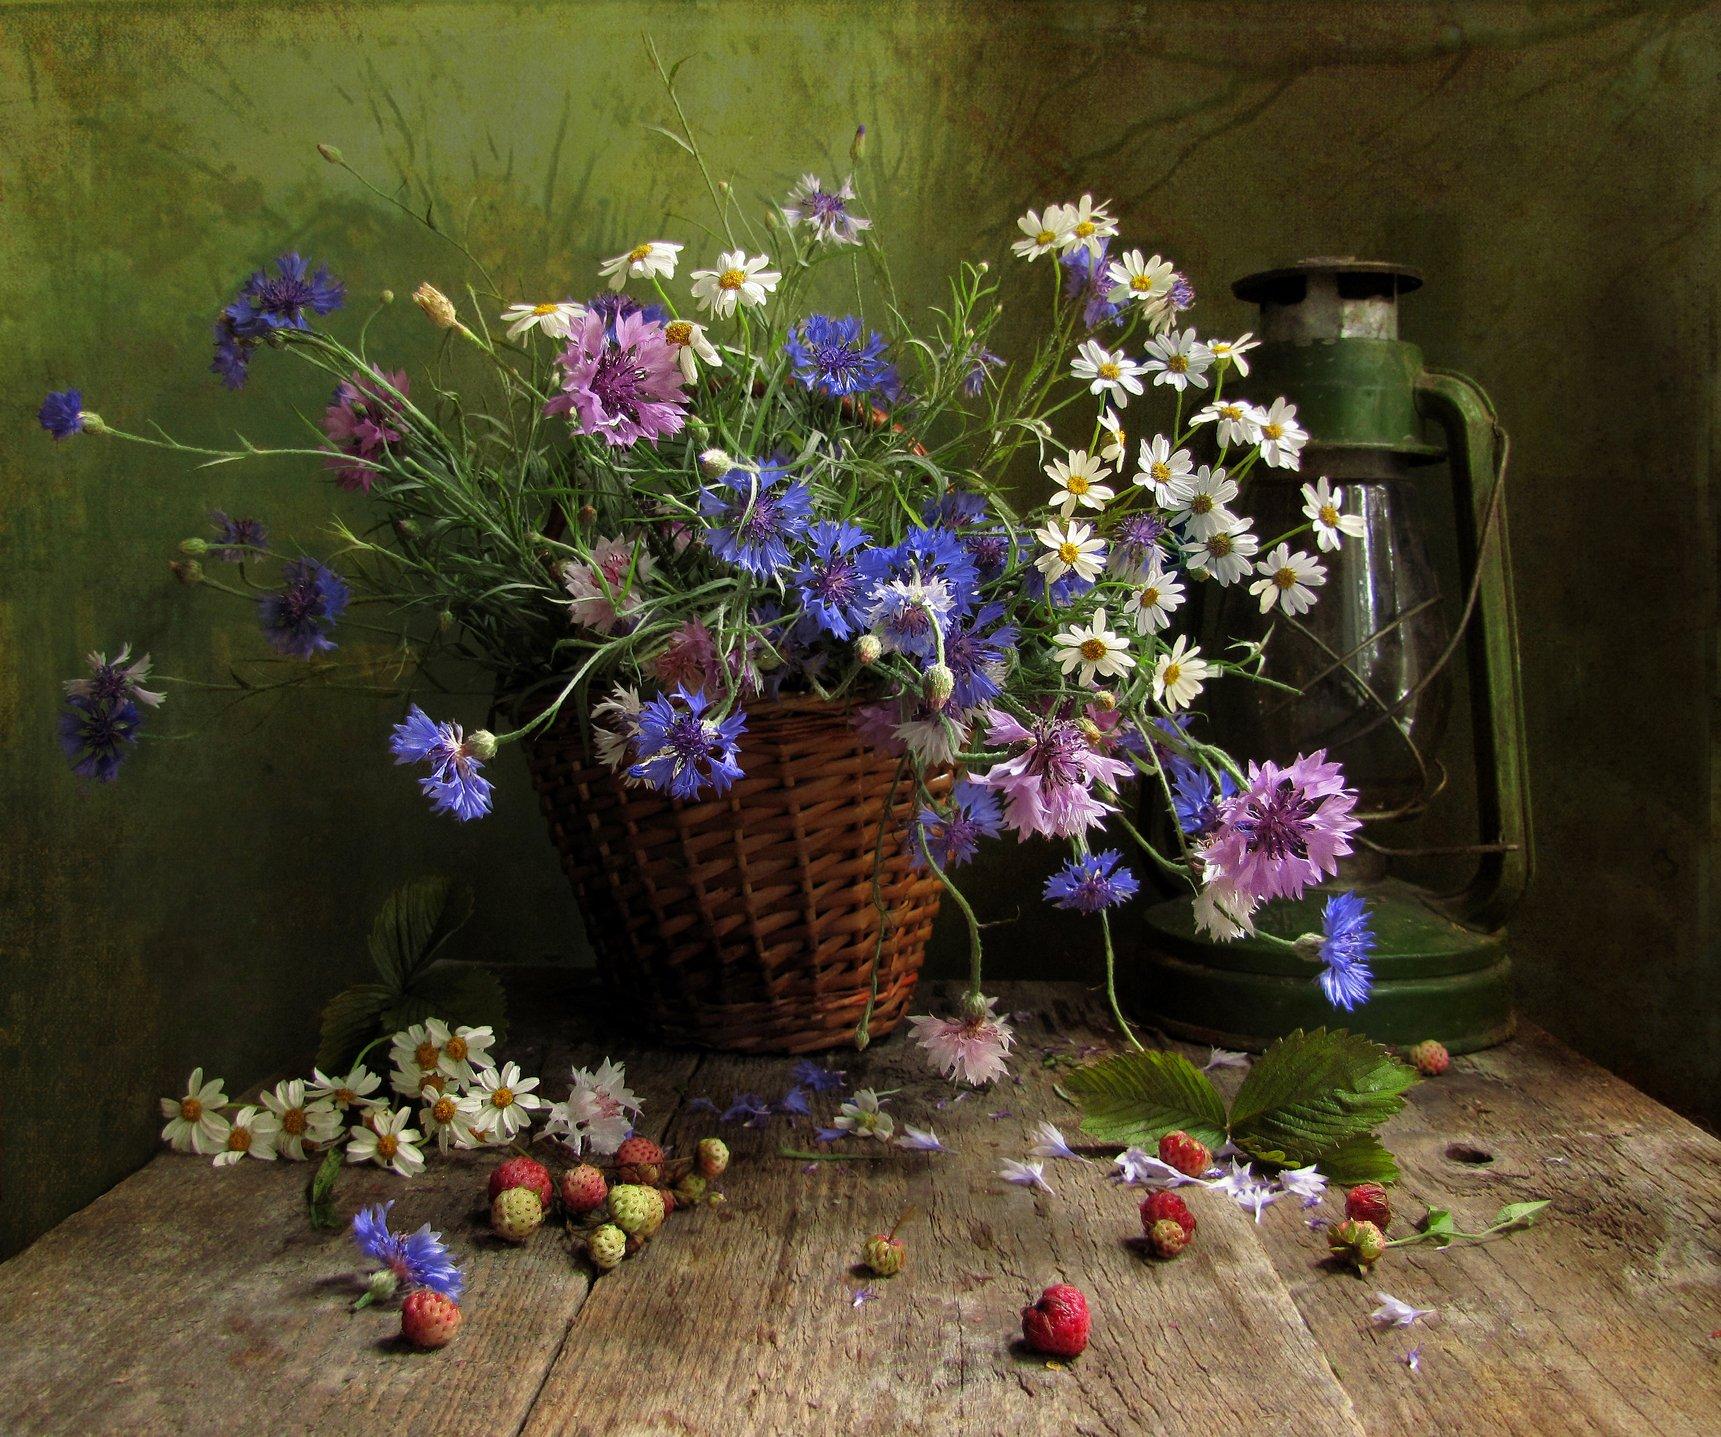 натюрморт, марина филатова, цветы, лето, Марина Филатова